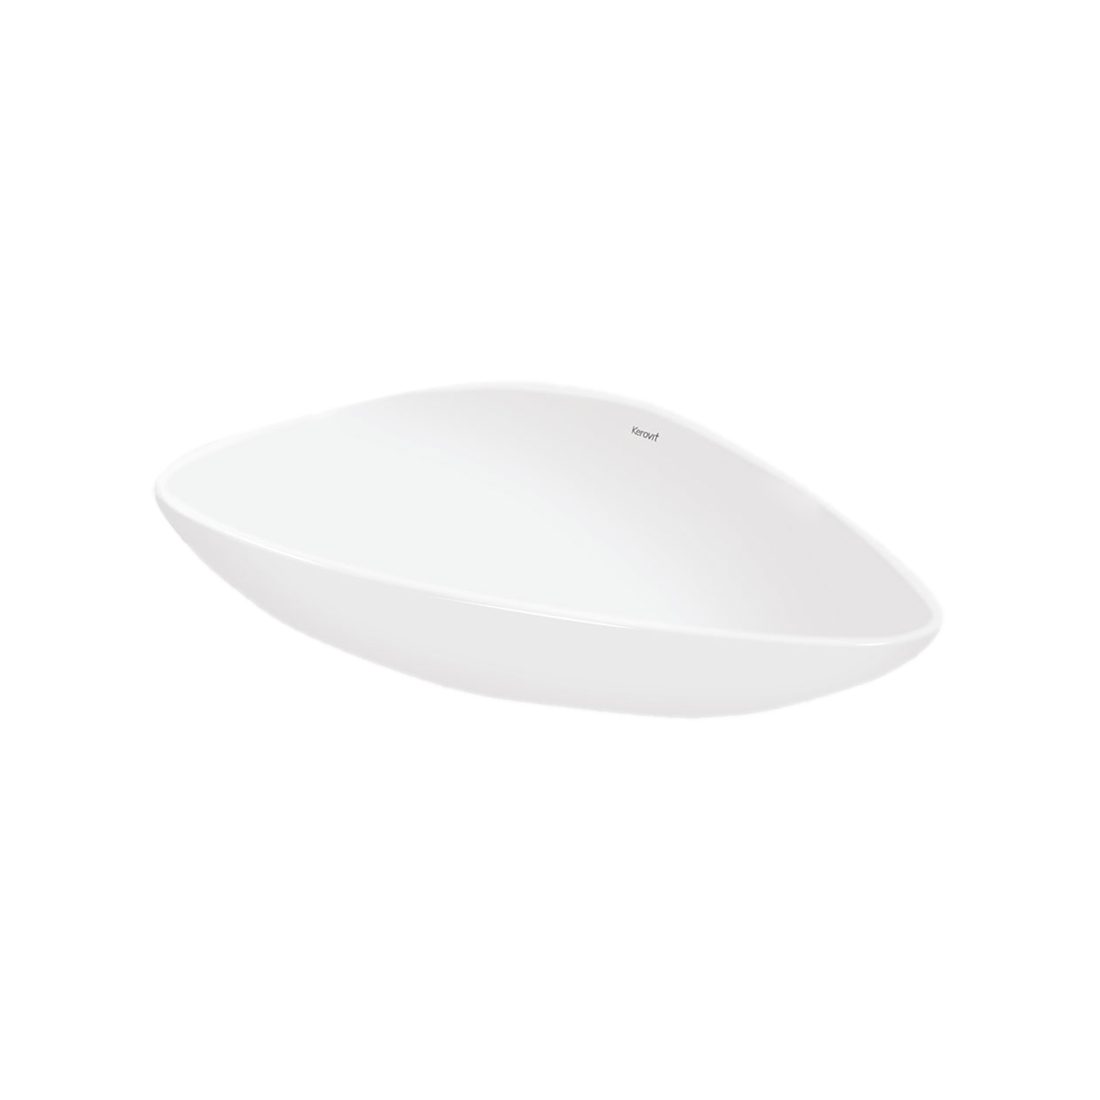 Kerovit Kimbra KS217 Counter Top Wash Basin